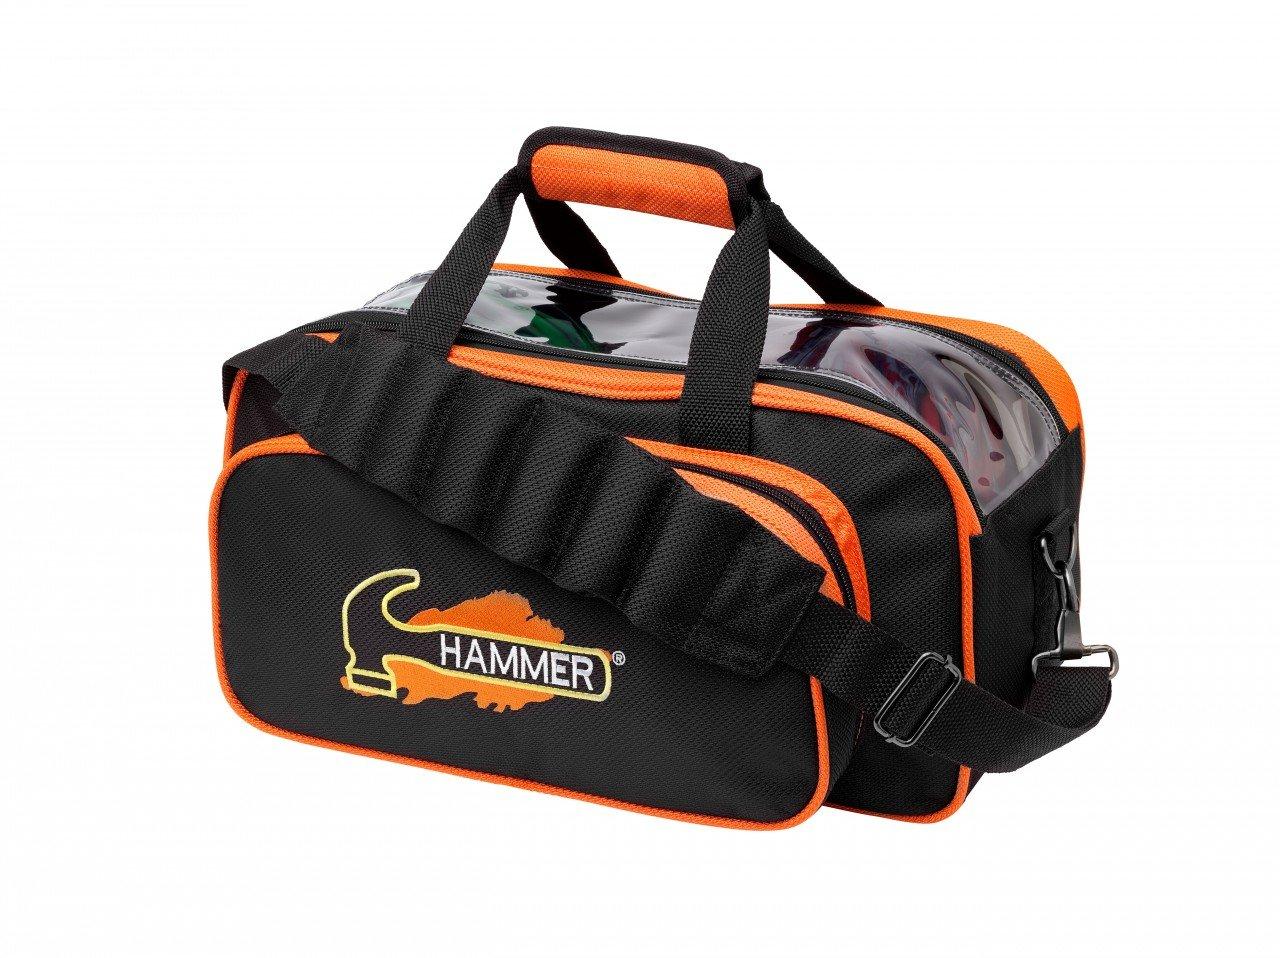 Hammer Double Bowling Ball Tote, Black/Orange